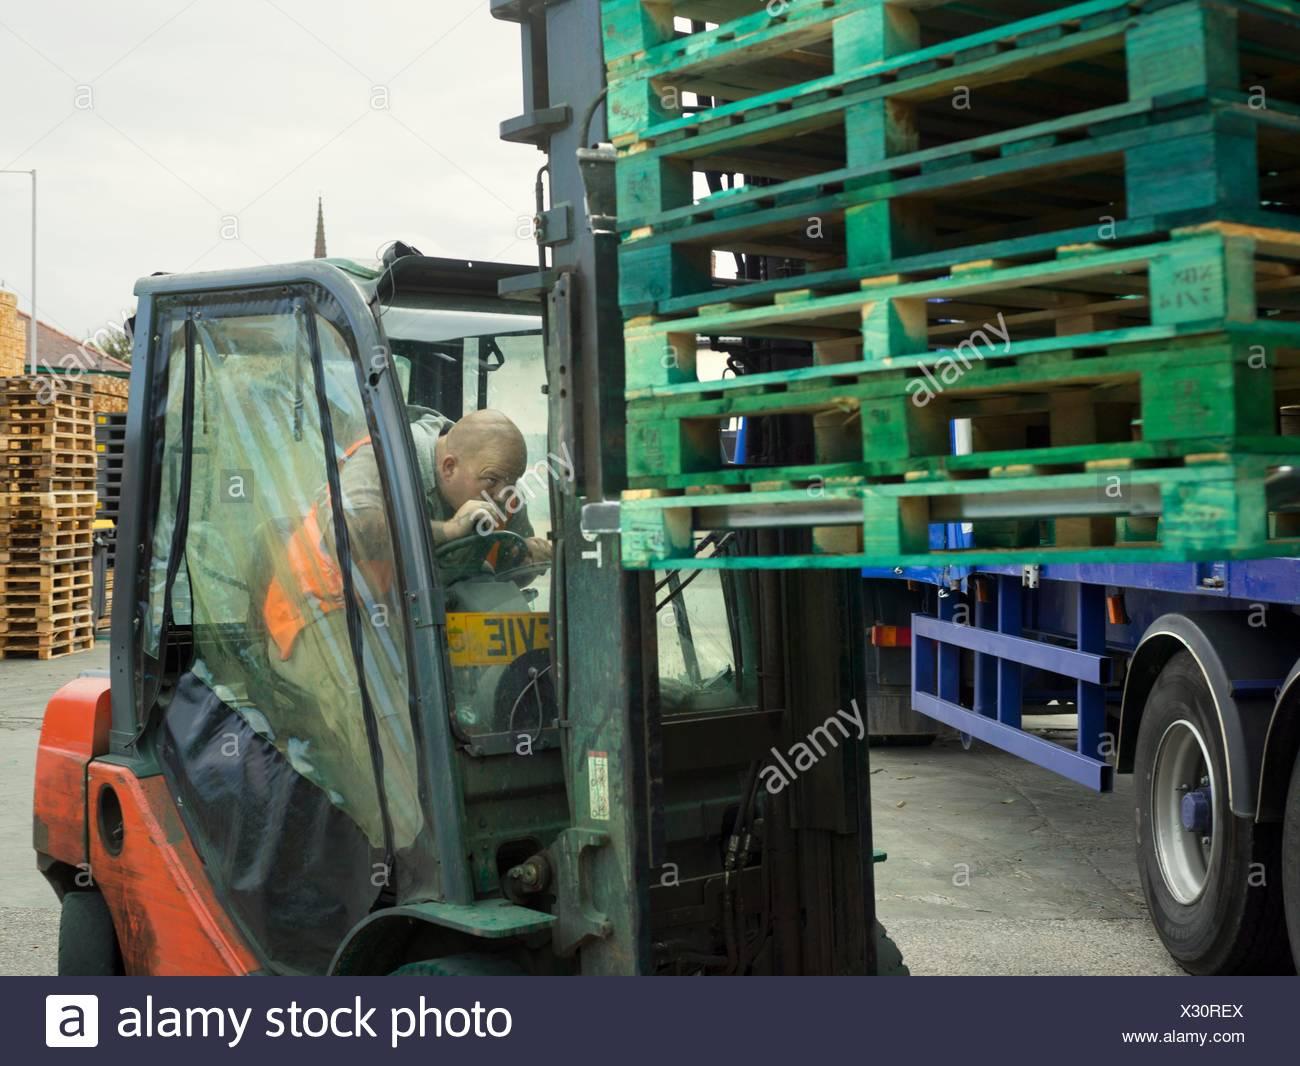 Forklift driver loading pallet stacks onto truck - Stock Image